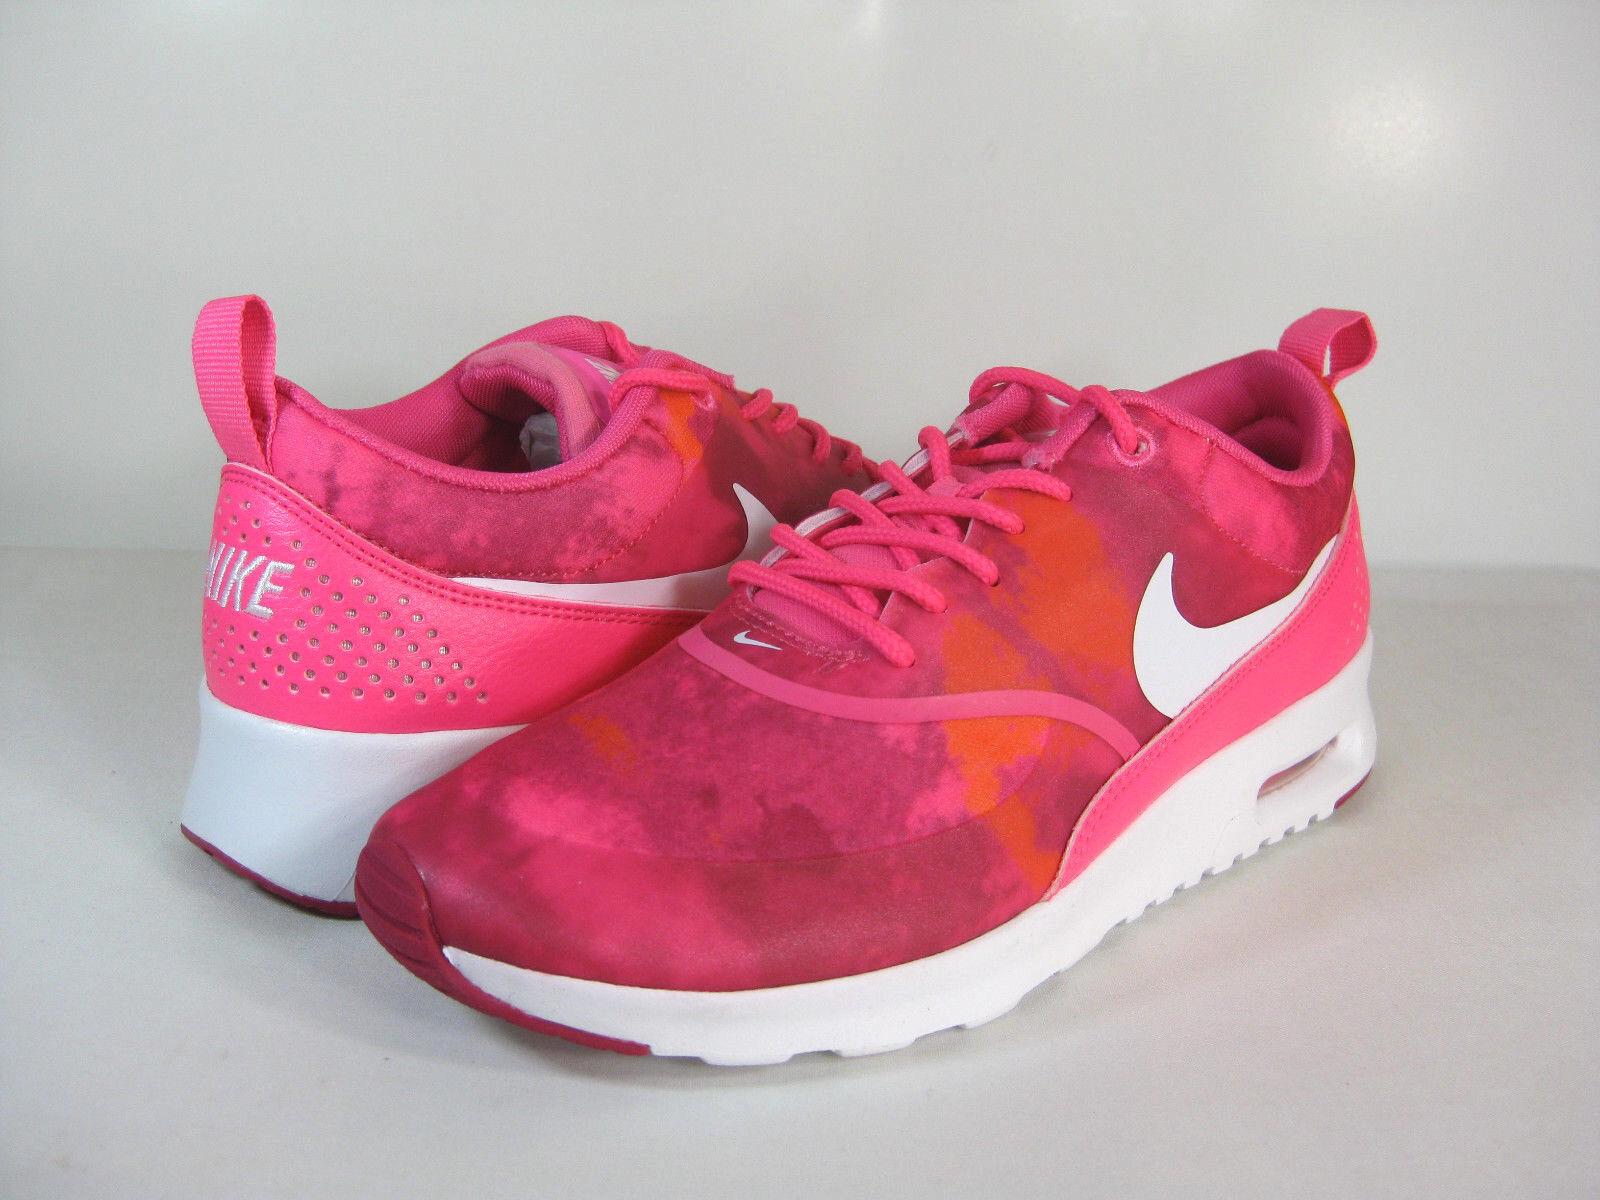 NIKE WMNS AIR MAX THEA PRINT Pink Pow/White-Fireberry-Total Orange -599408 602- Seasonal price cuts, discount benefits